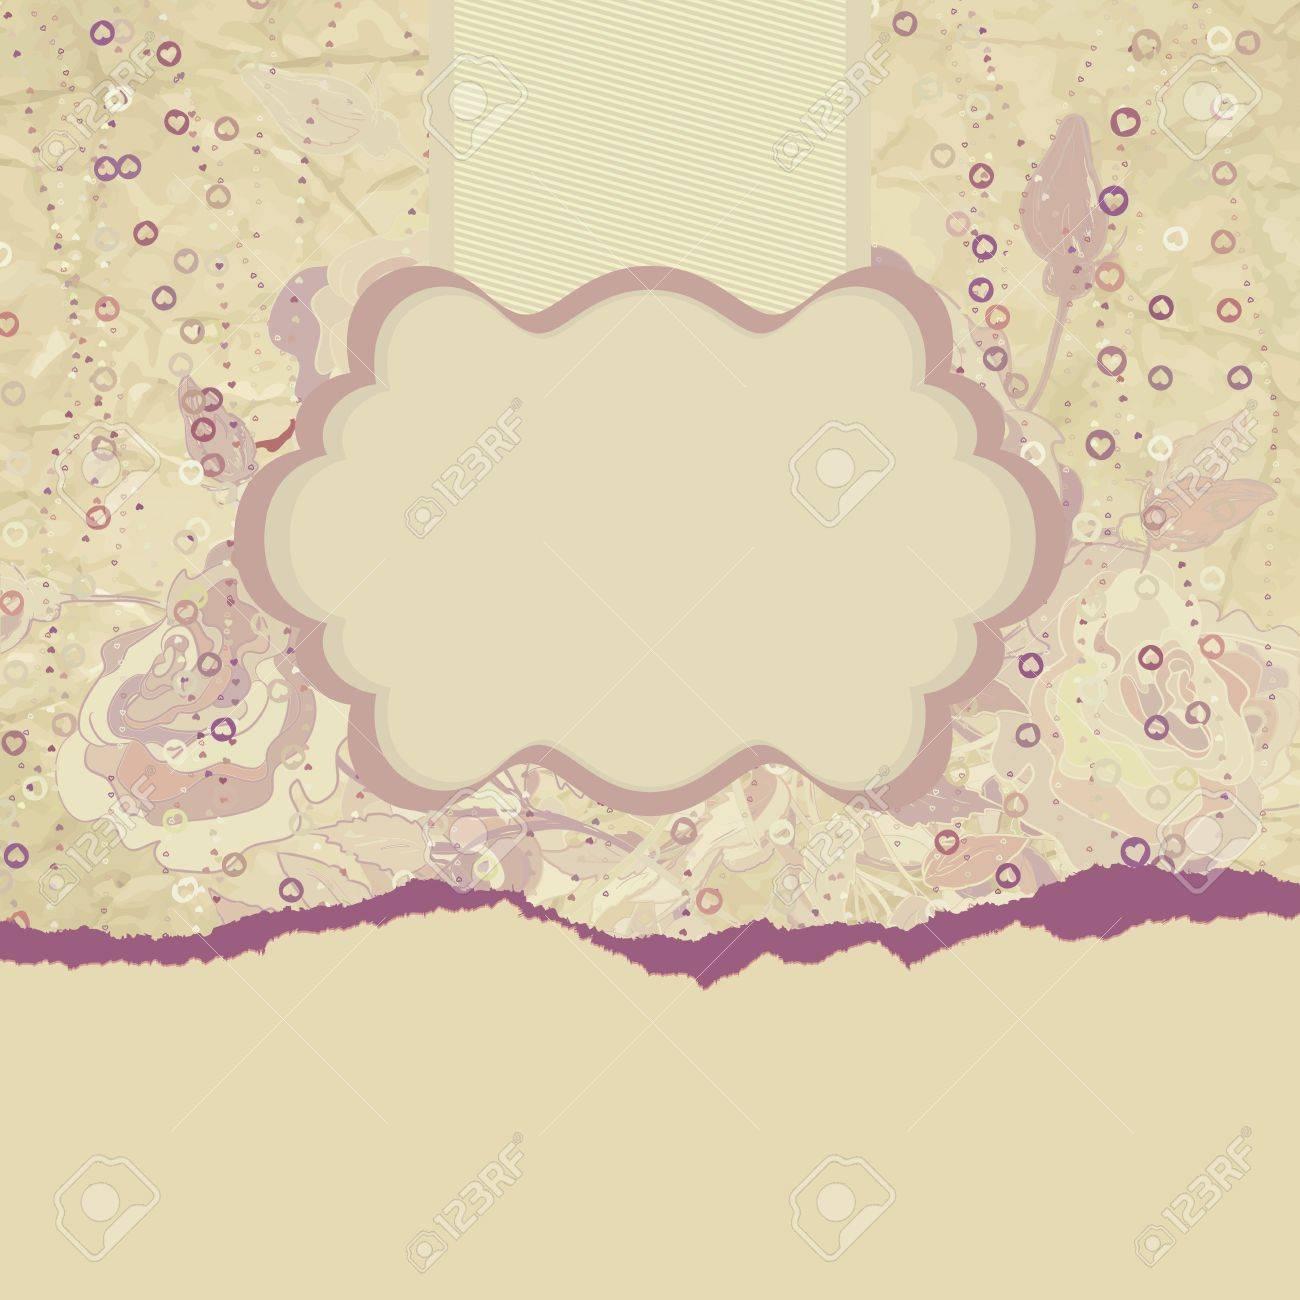 Grunge romantic flower in vintage style Stock Vector - 15471389